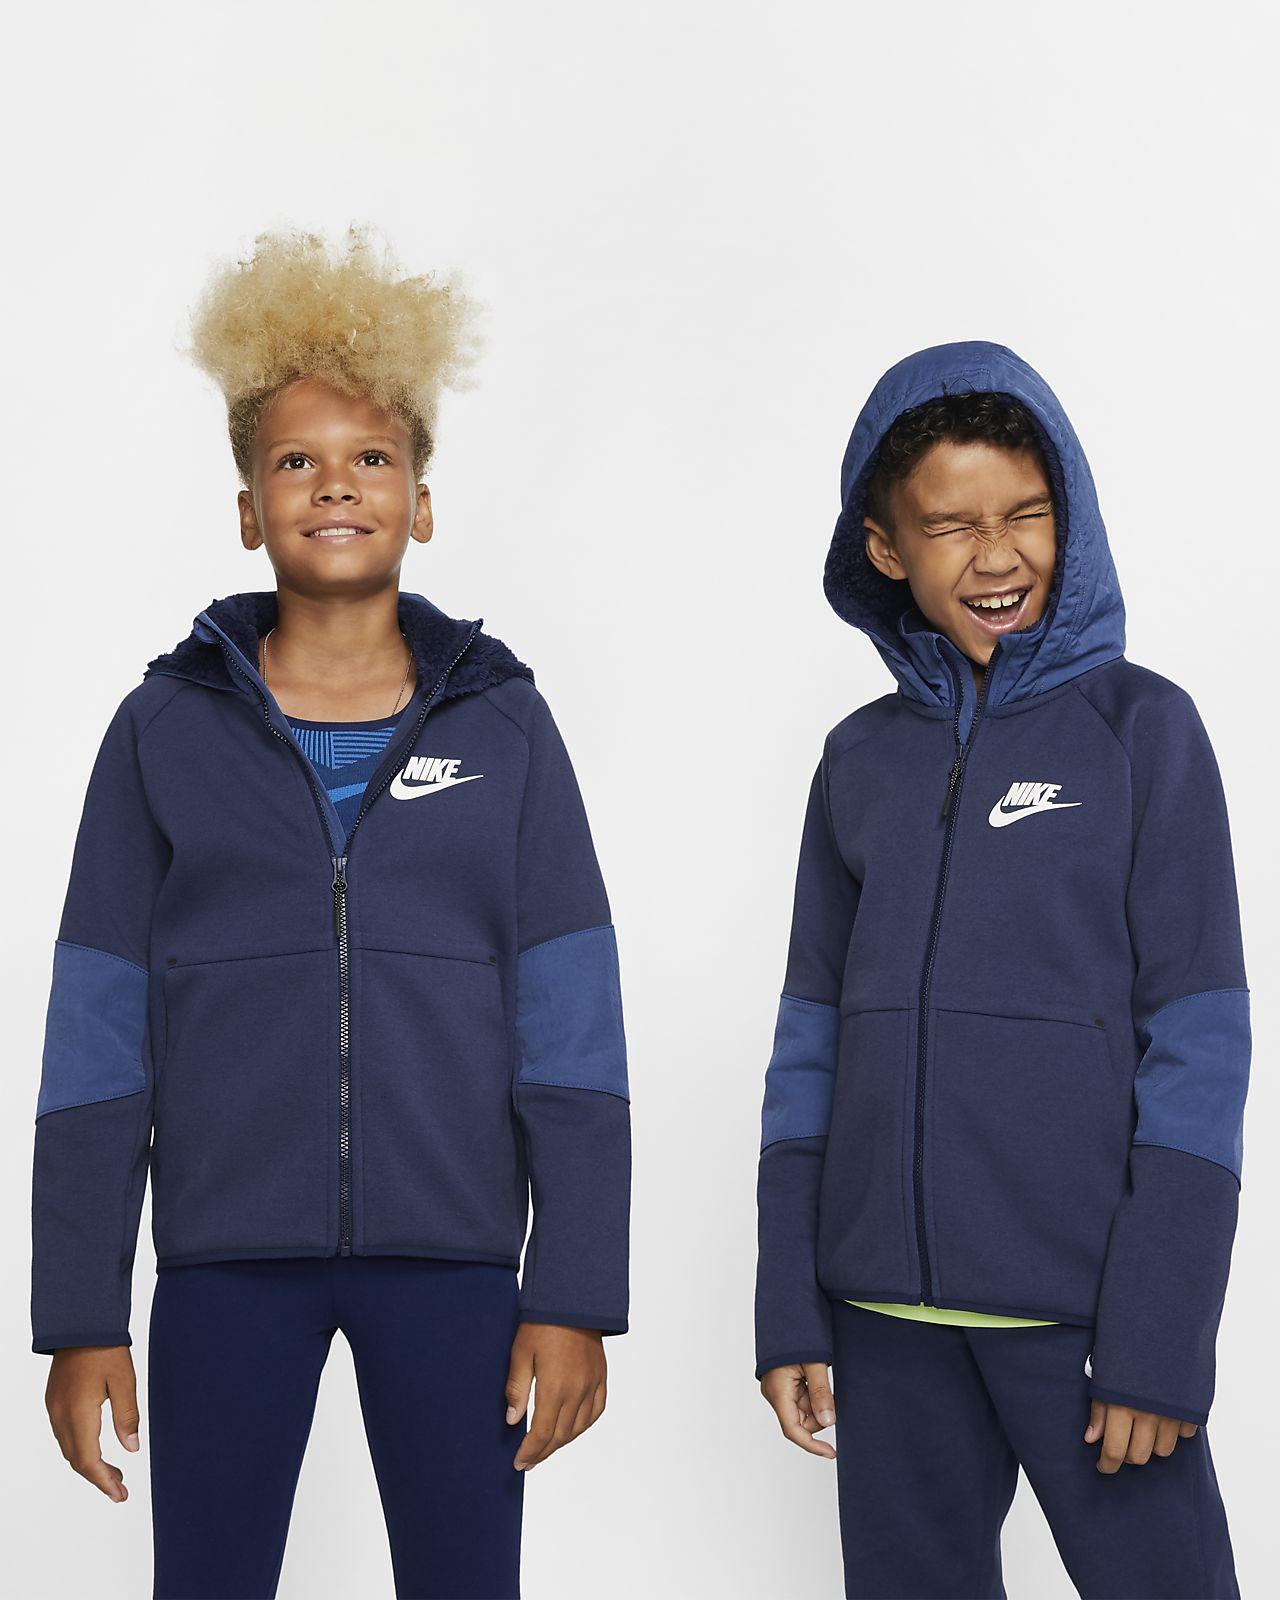 Nike Sportswear Winterized Tech Fleece Dessuadora amb caputxa i cremallera completa - Nen/a